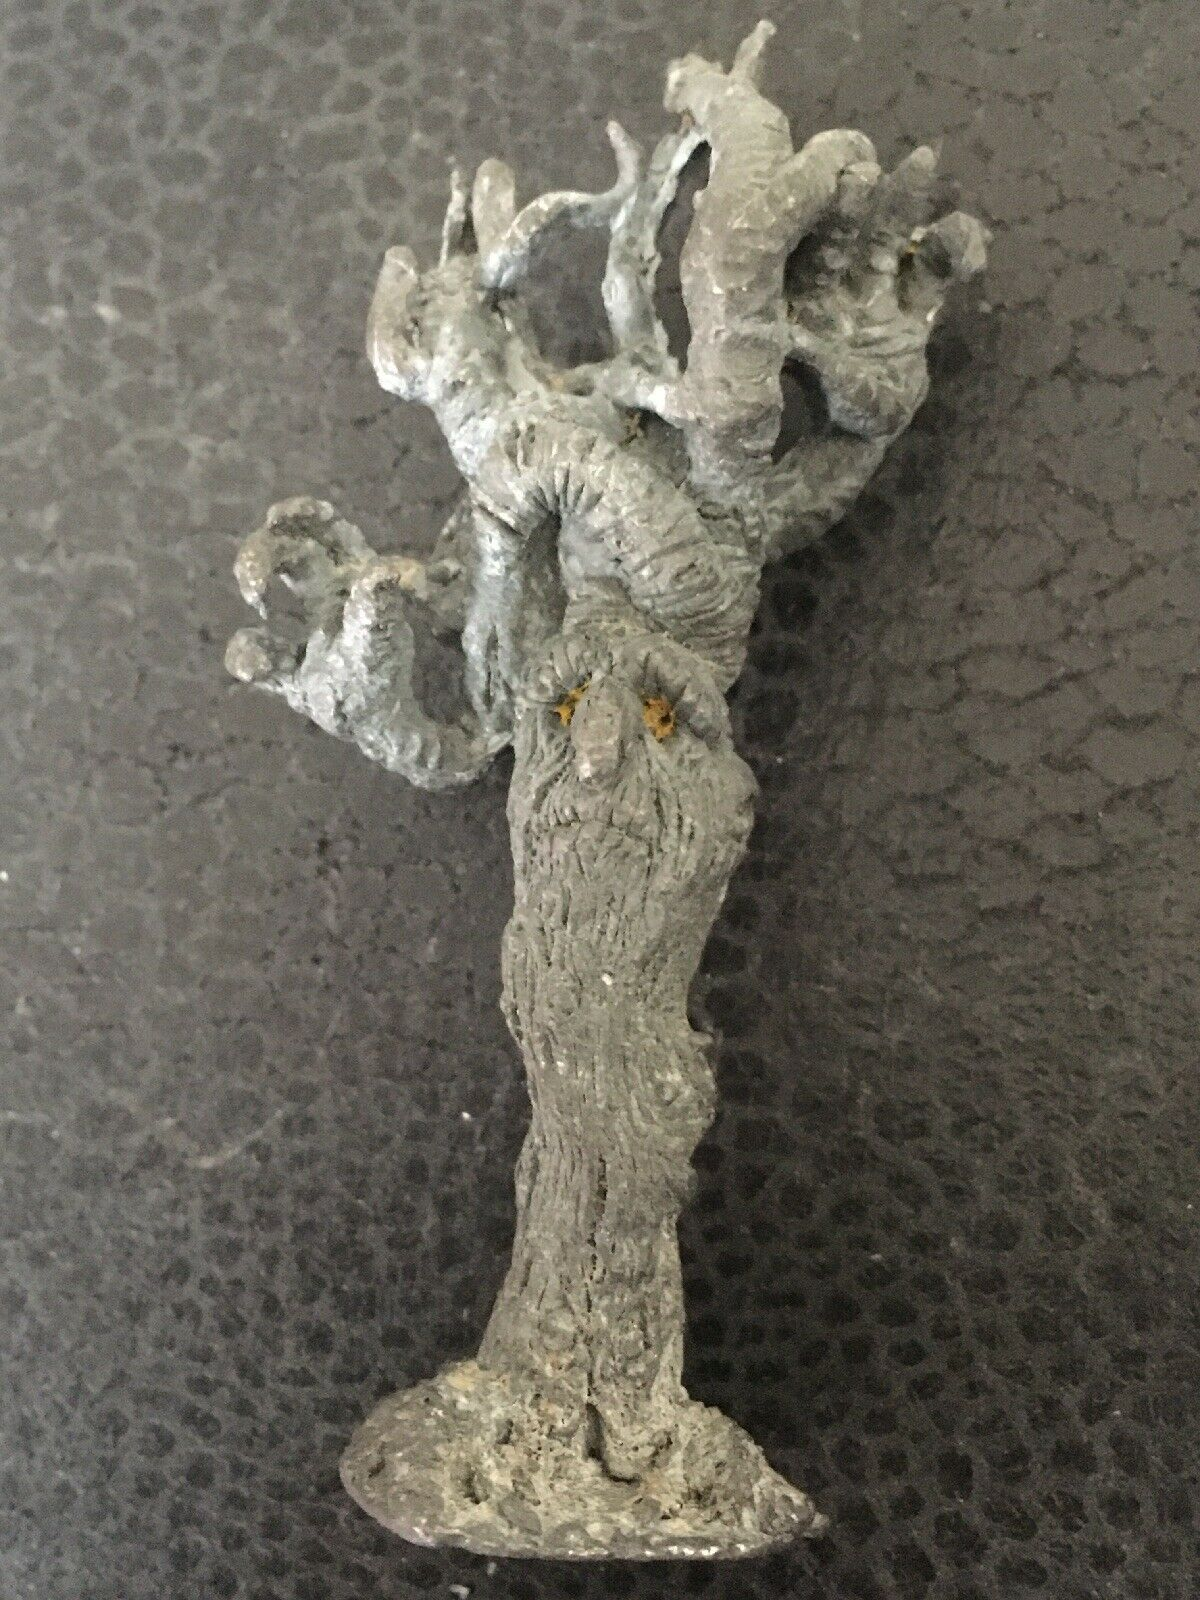 Tragedy Of Mcdeath Scenario Klinty Treeman FF11 -2  Metal Games Workshop OOP